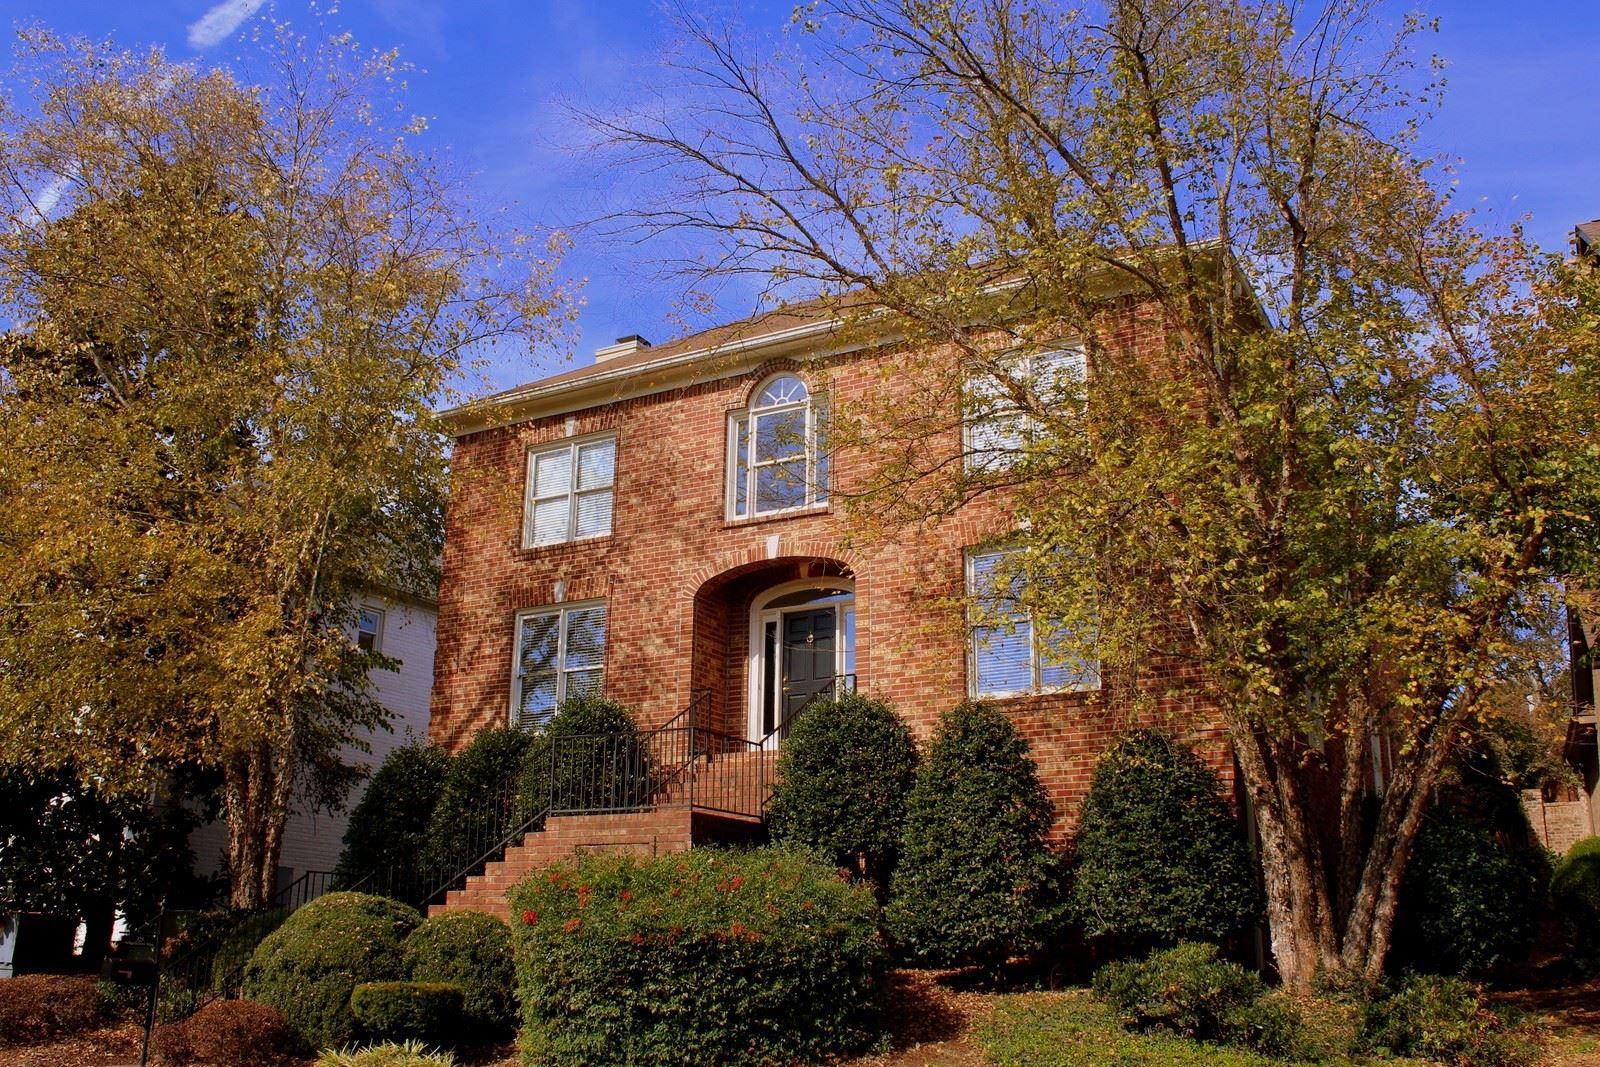 325 Whitworth Way, Nashville, TN 37205 - MLS#: 2180208